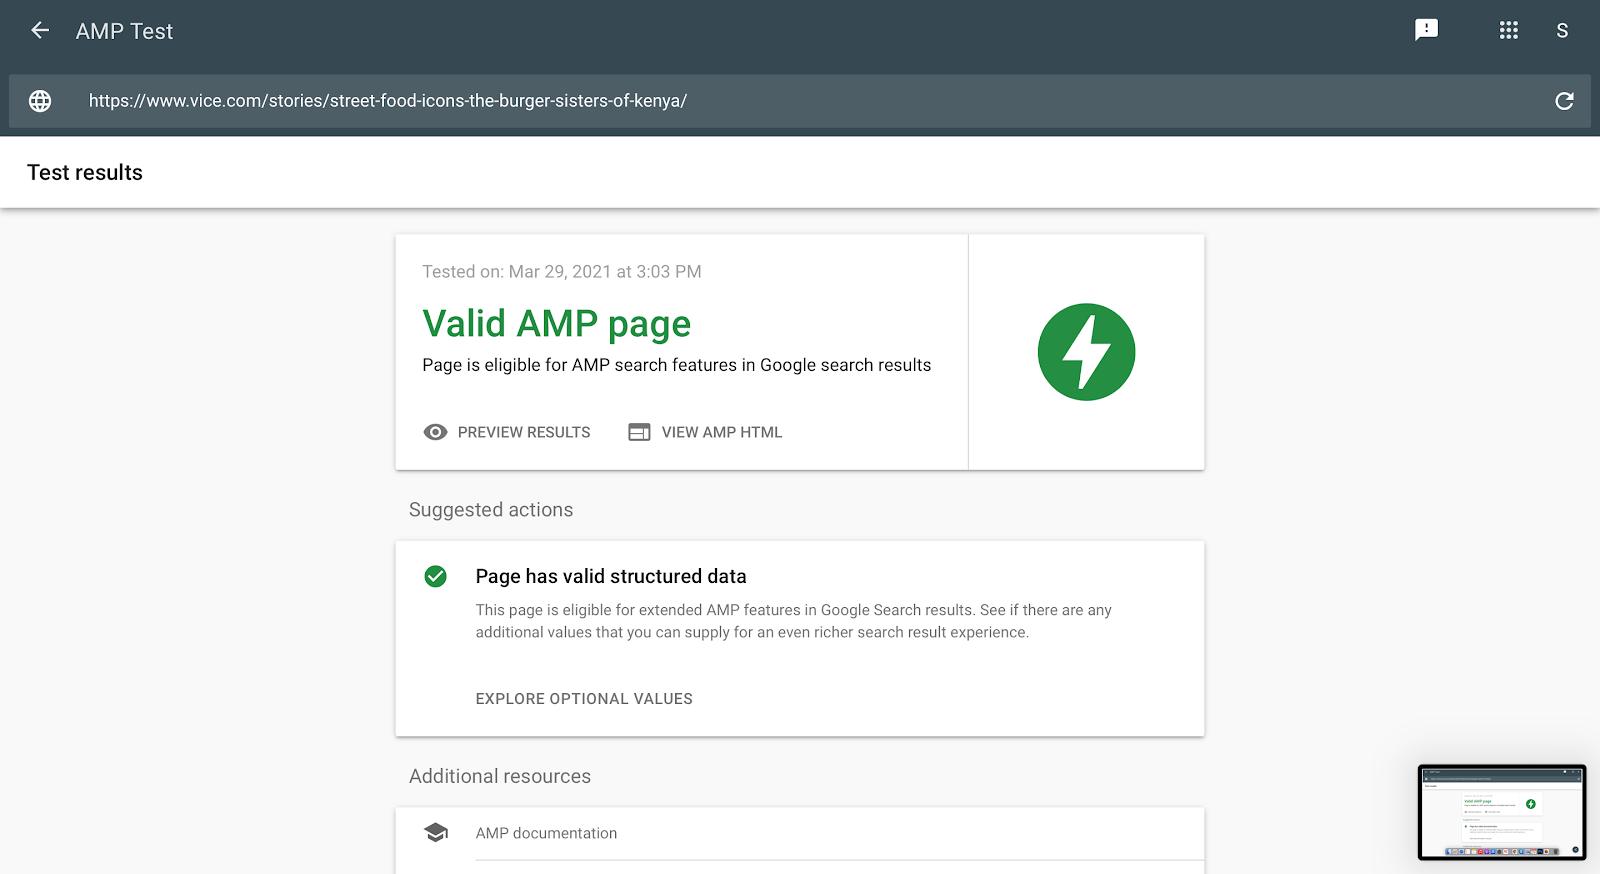 amp_testing_tool